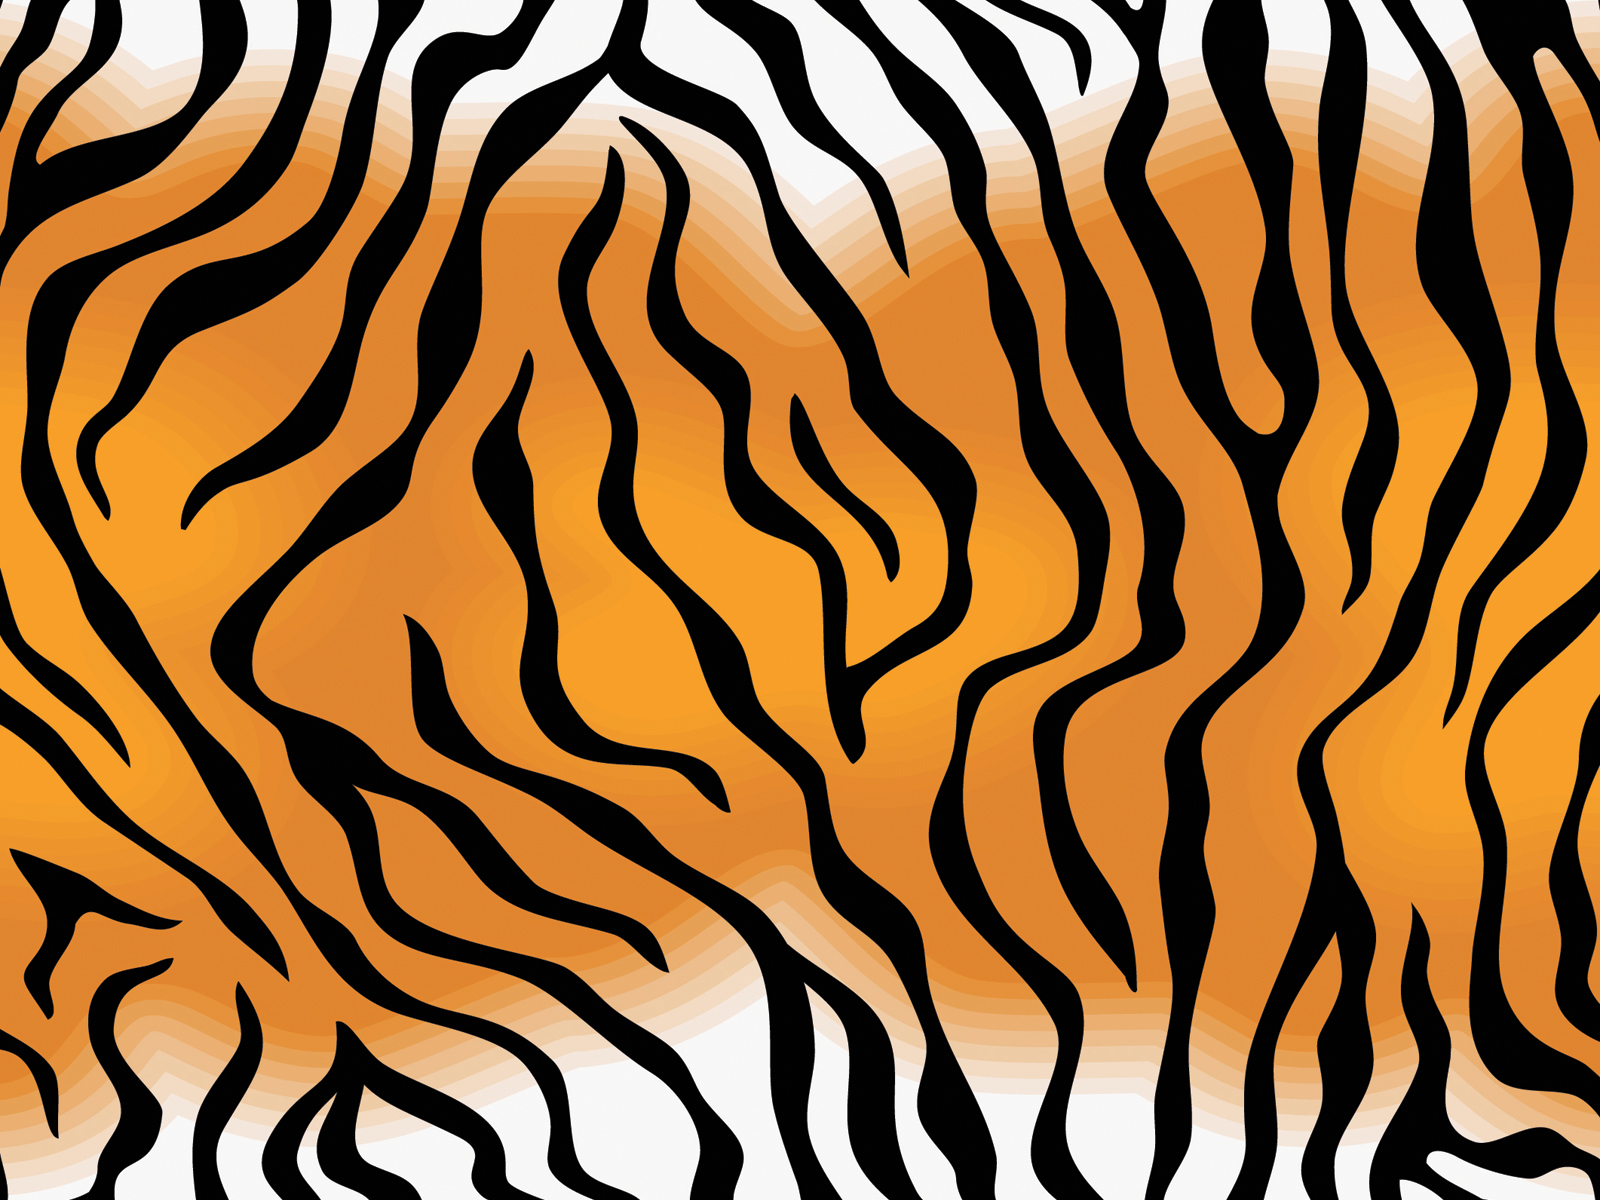 tiger skin pattern backgrounds animals pattern